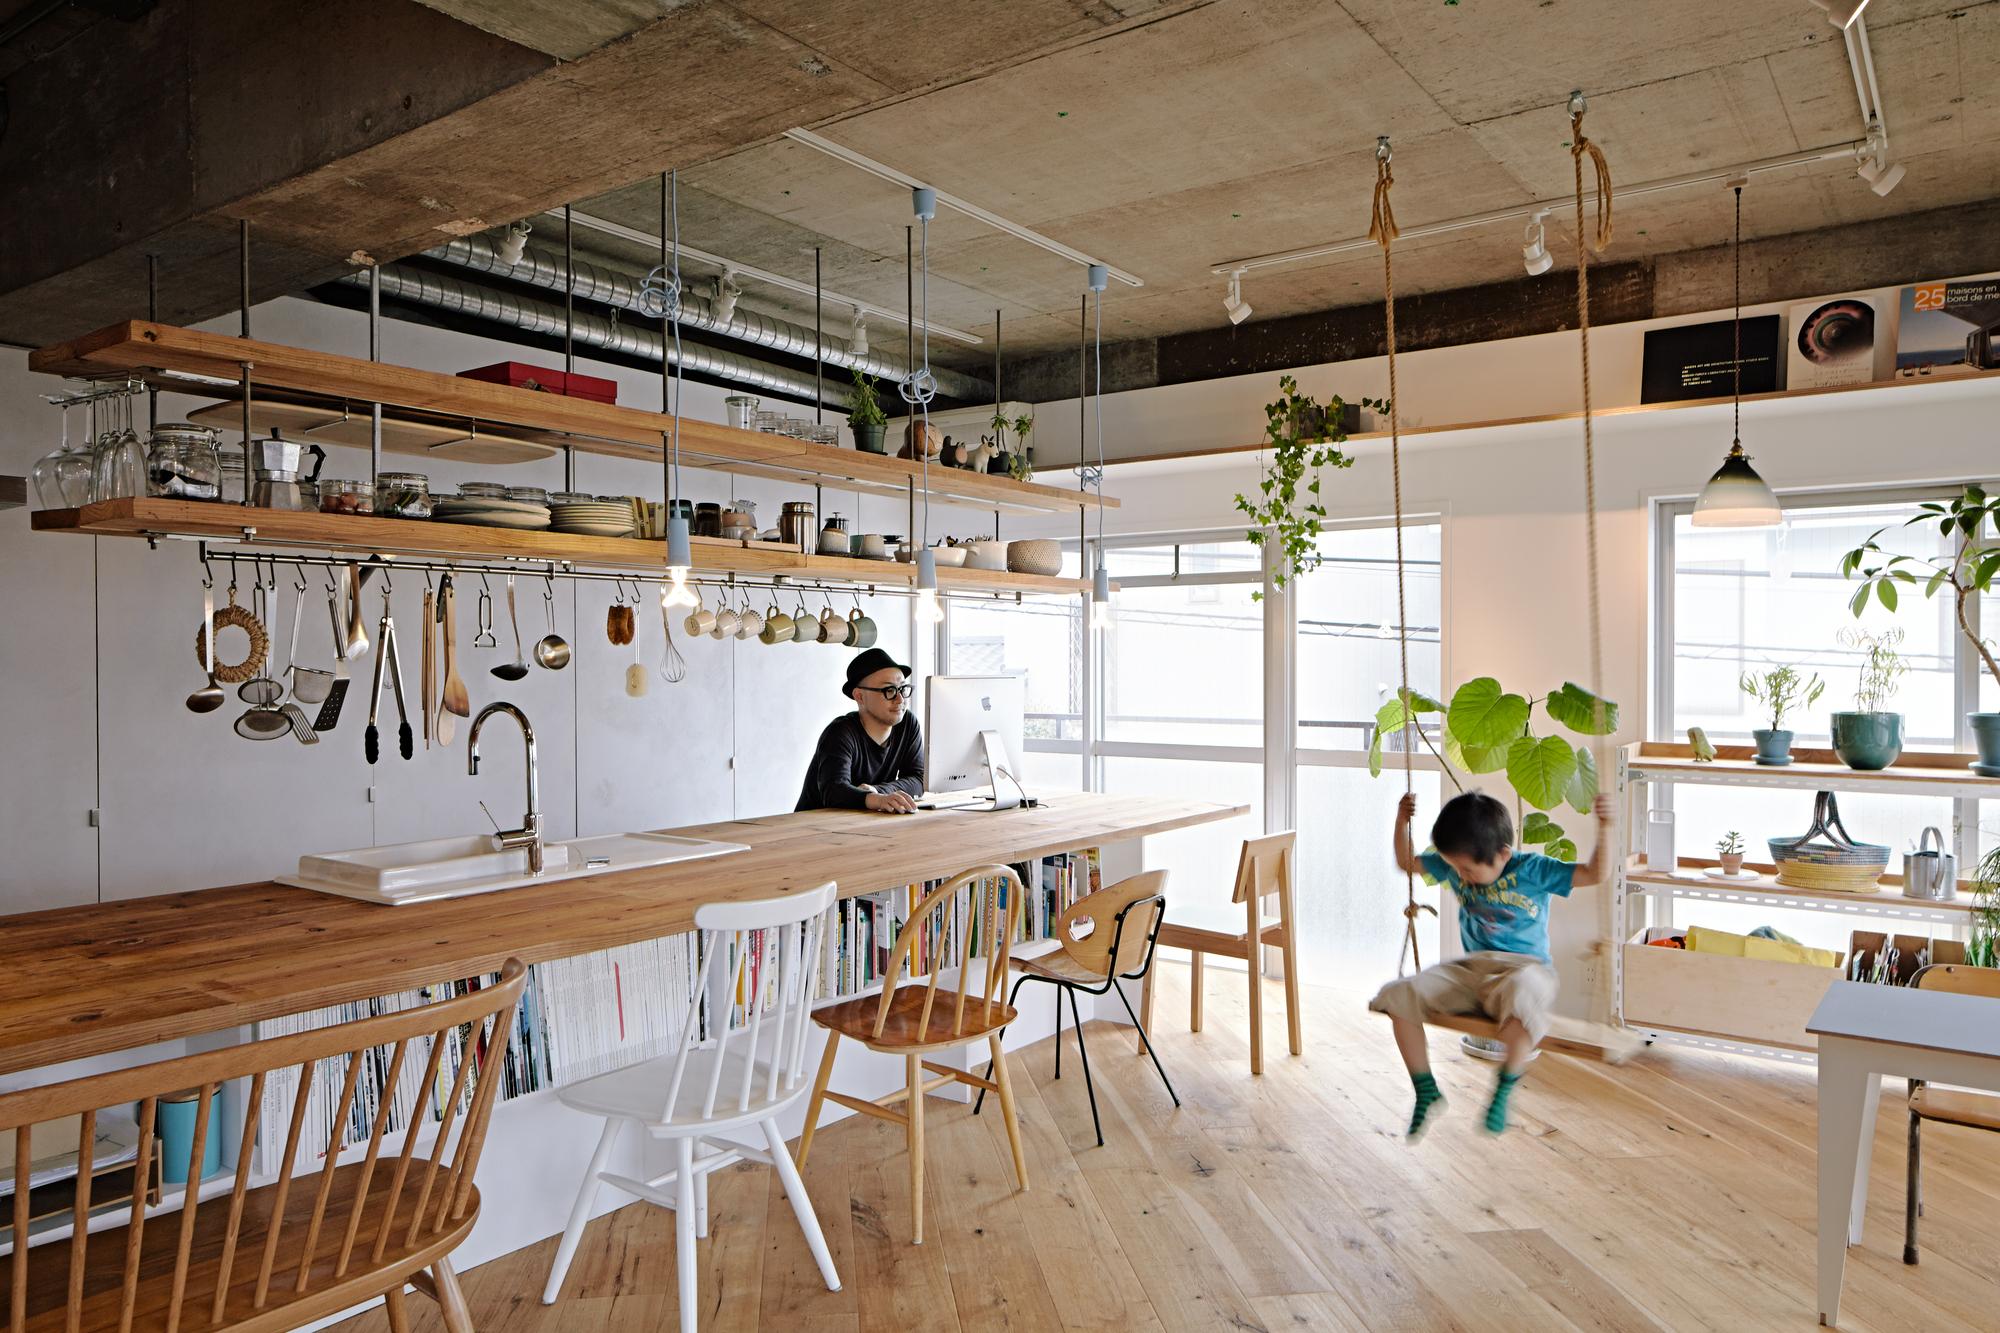 Tenhachi House 8 Tenhachi Architect Interior Design ArchDaily